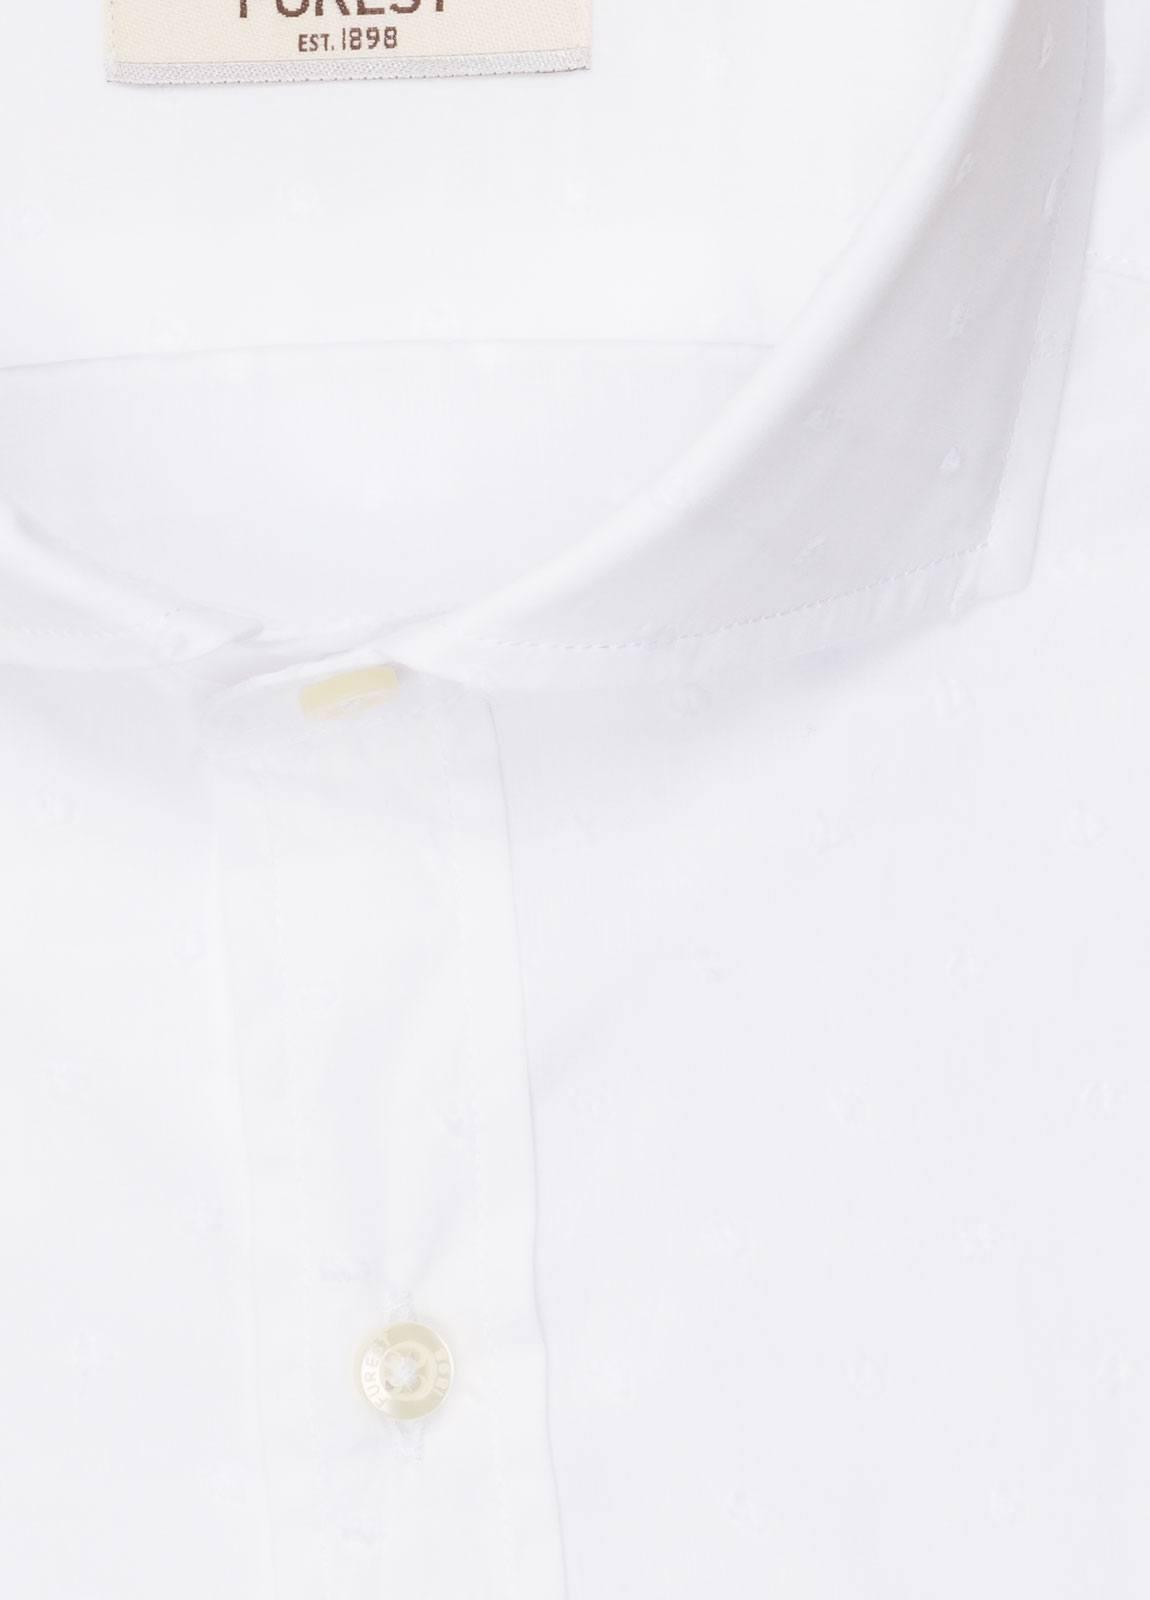 Camisa sport FUREST COLECCIÓN SLIM FIT fil coupé blanco - Ítem1